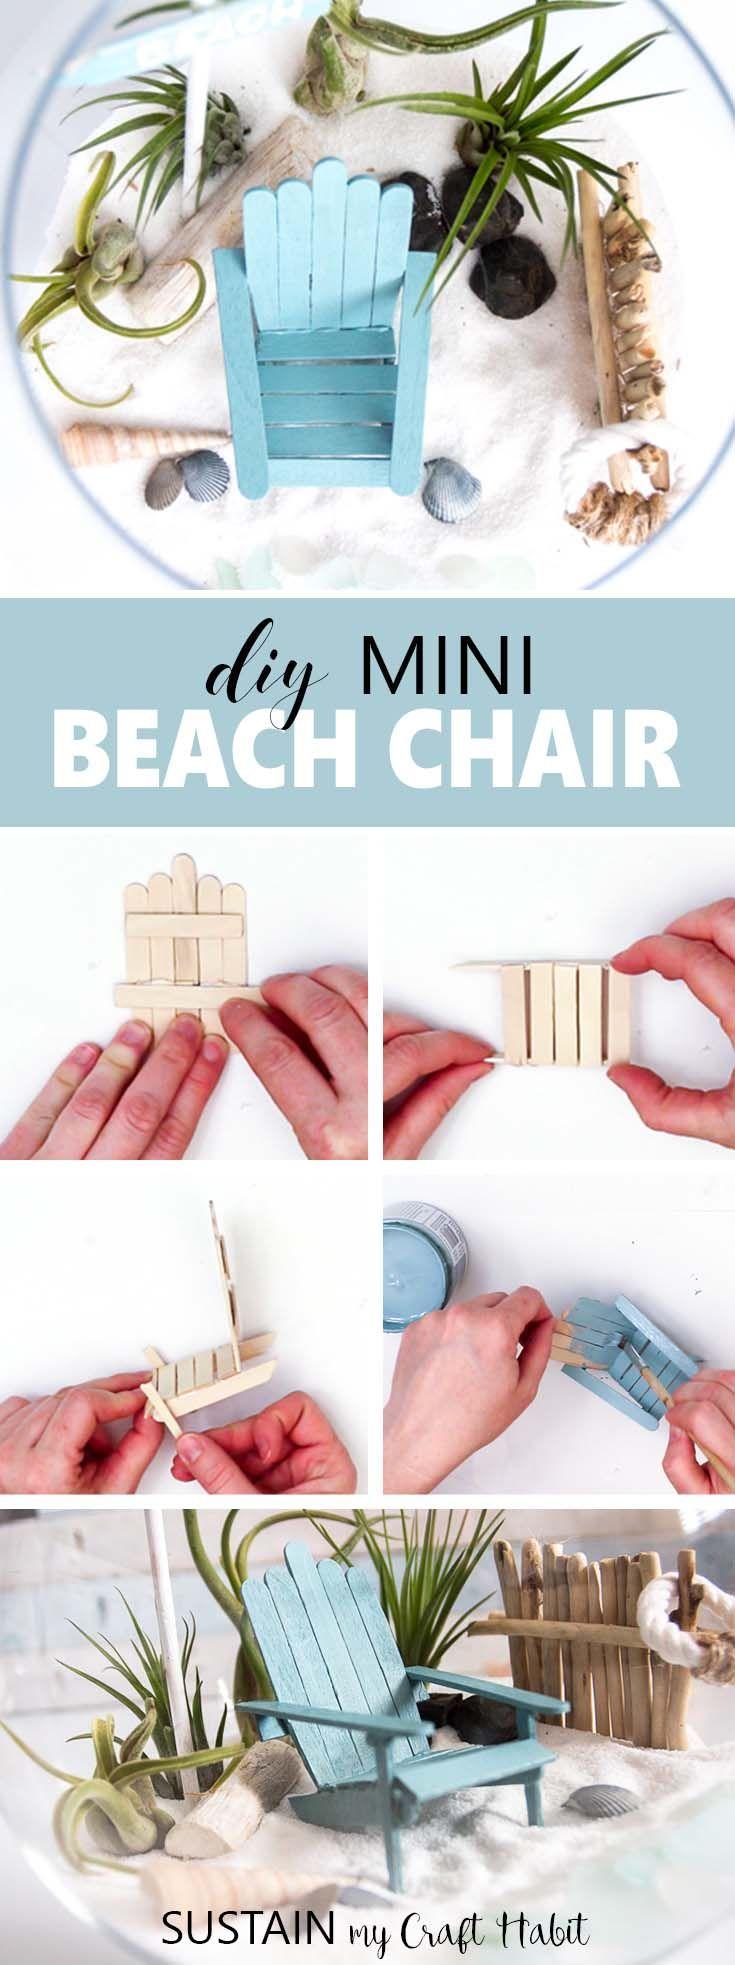 Adorable Mini Adirondack Chairs!